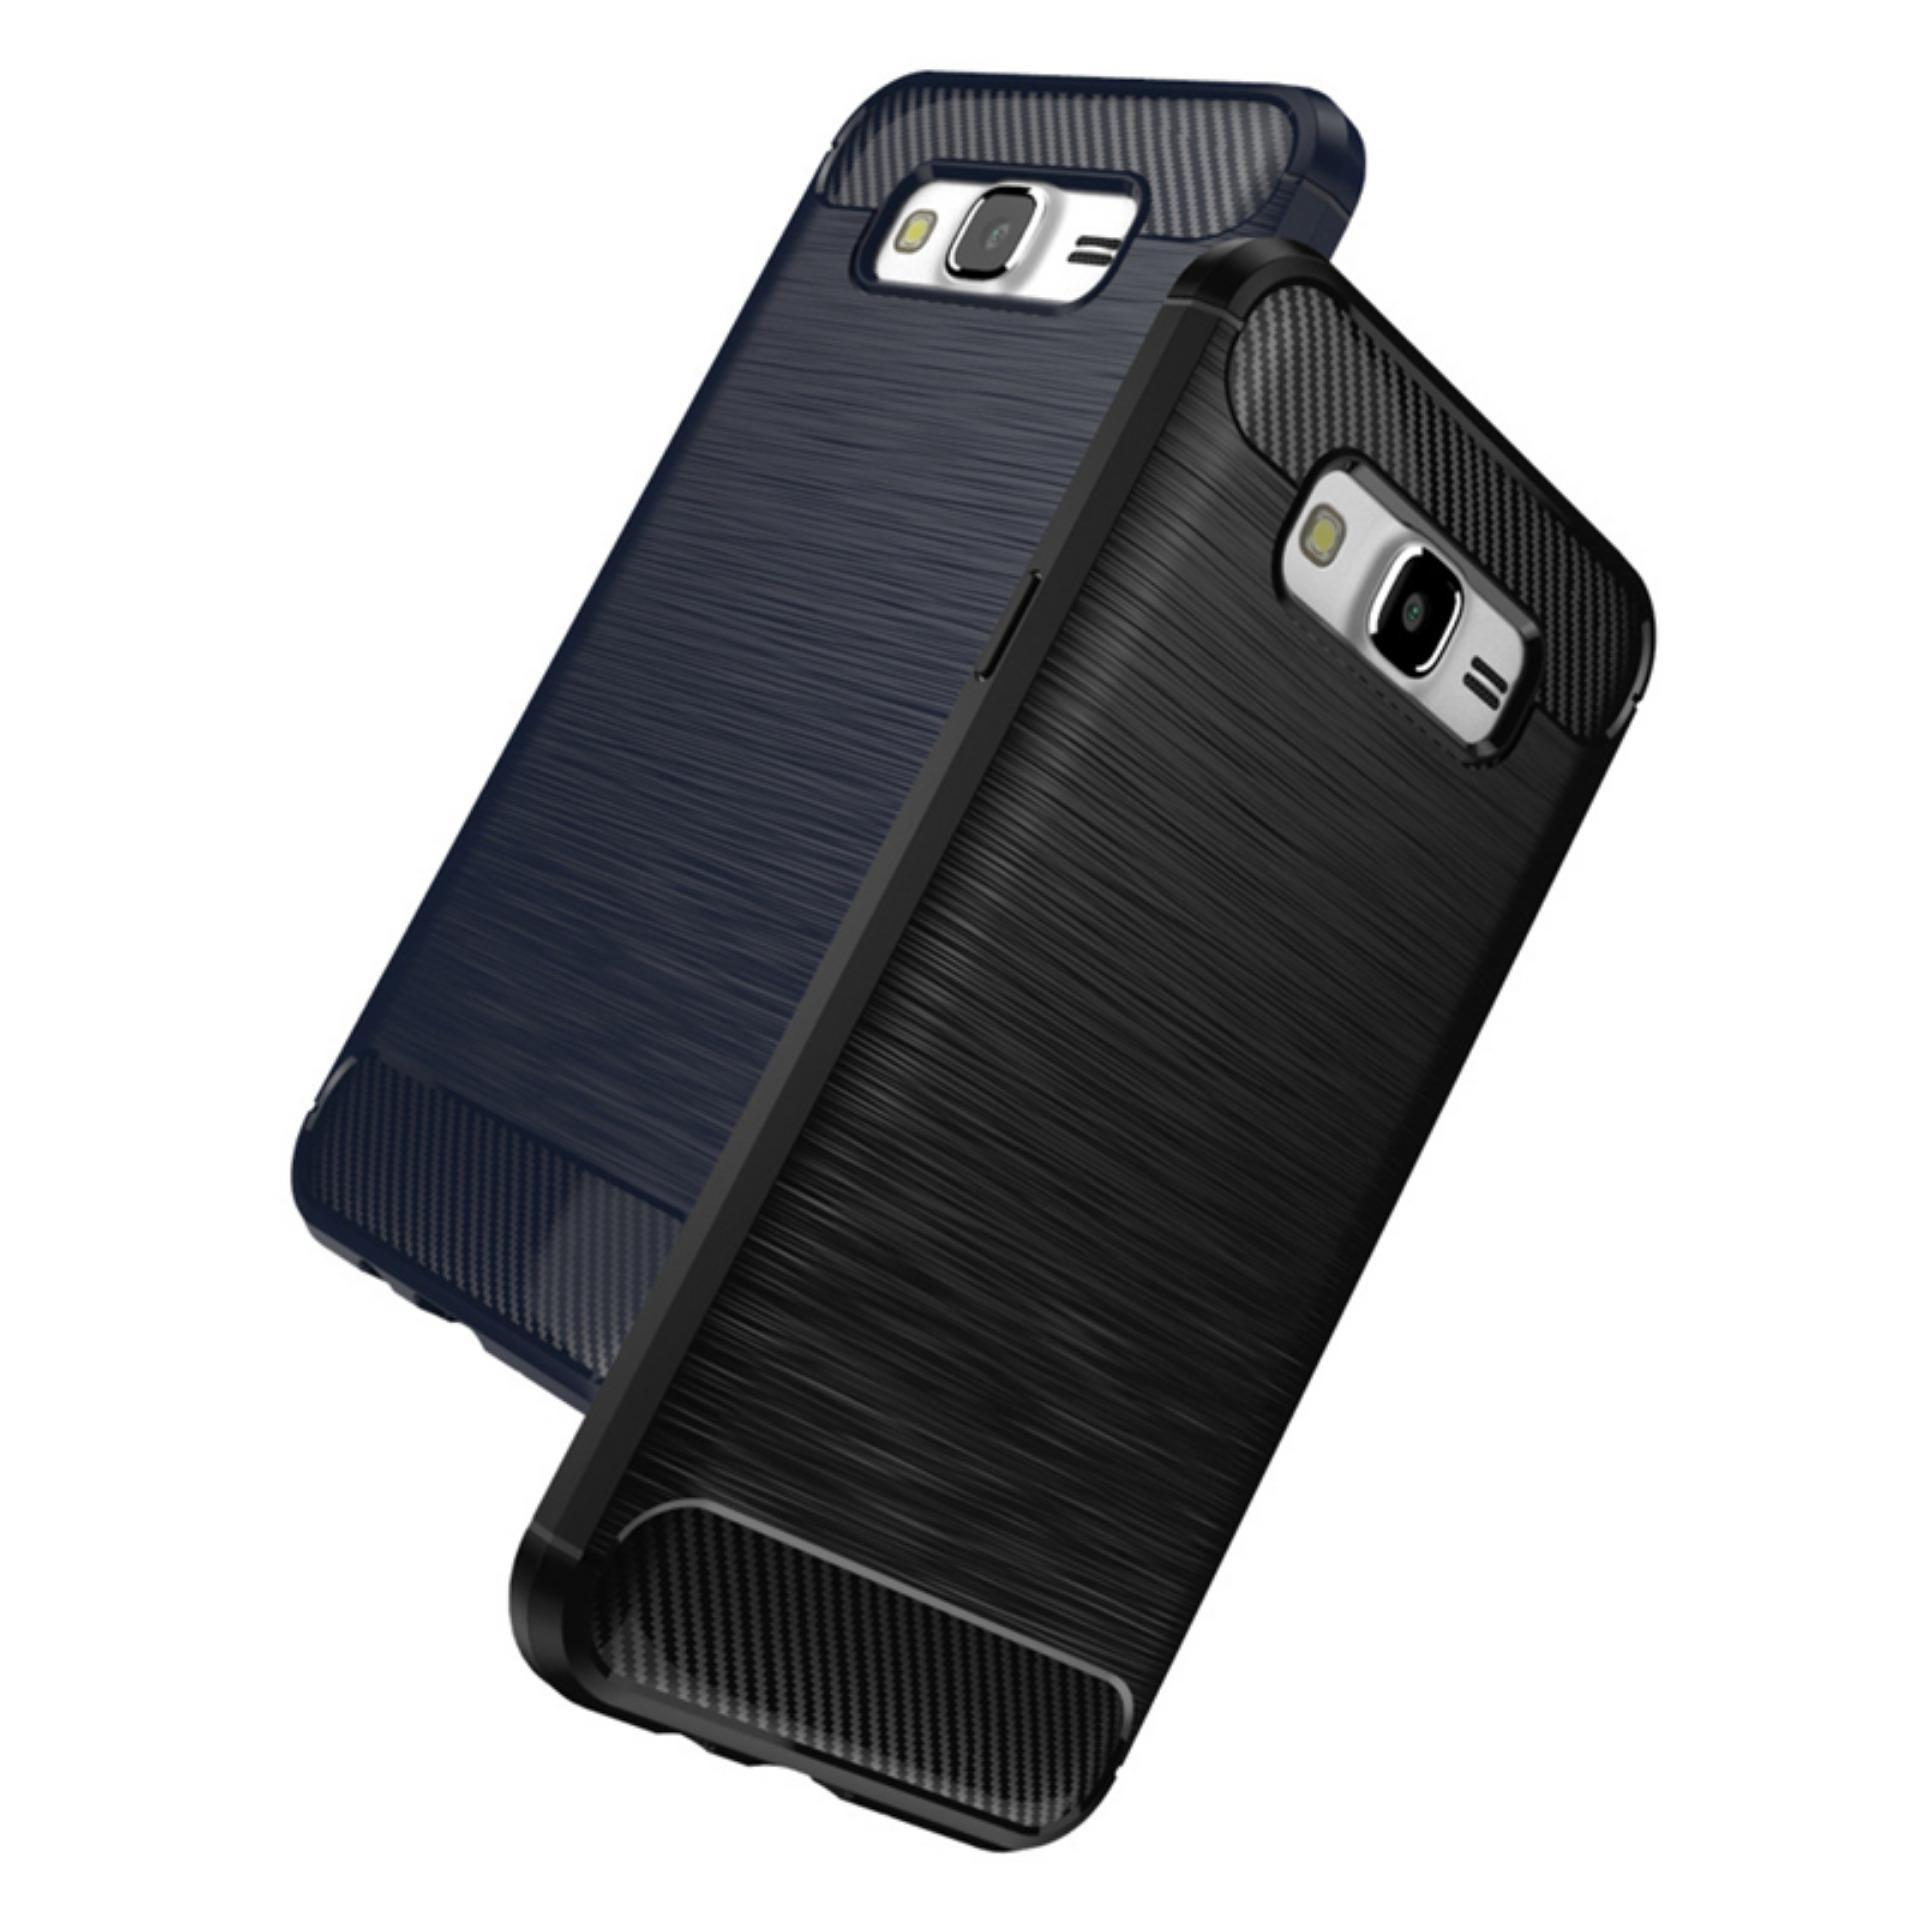 iPaky Carbon Fiber Shockproof Hybrid Case for Samsung Galaxy GrandPrime G530 / G531 - Black +